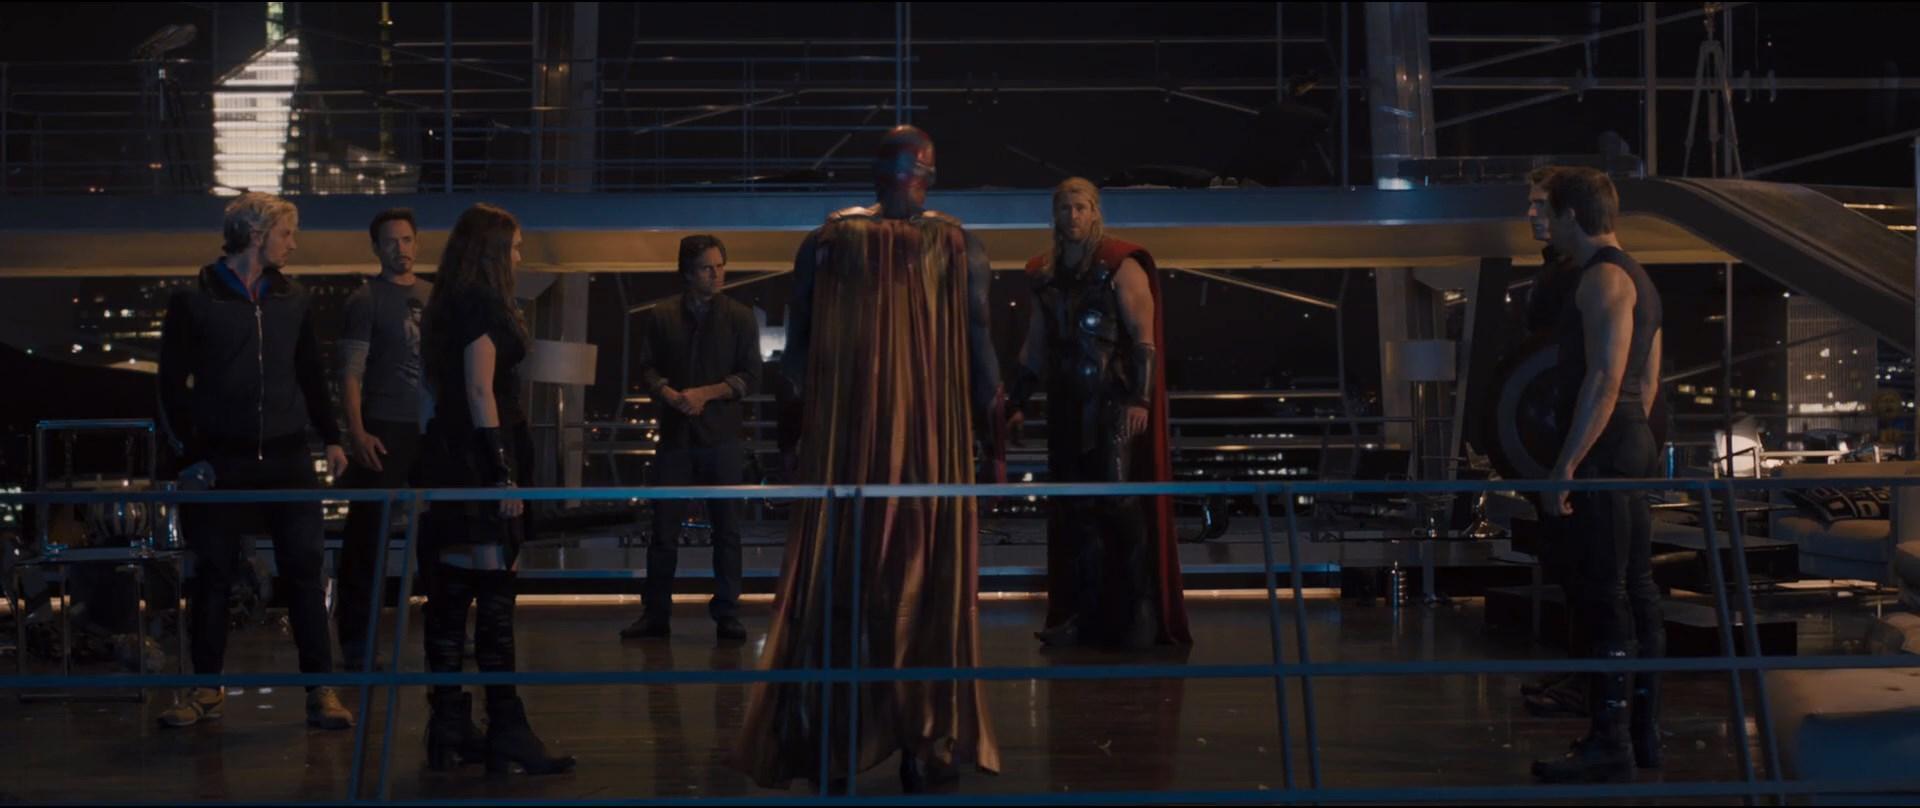 Avengers.Age.of.Ultron.2015.1080p.5.1CH.Ganool (1)_0002.mkv_snapshot_01.32.21_[2015.09.13_03.22.28]